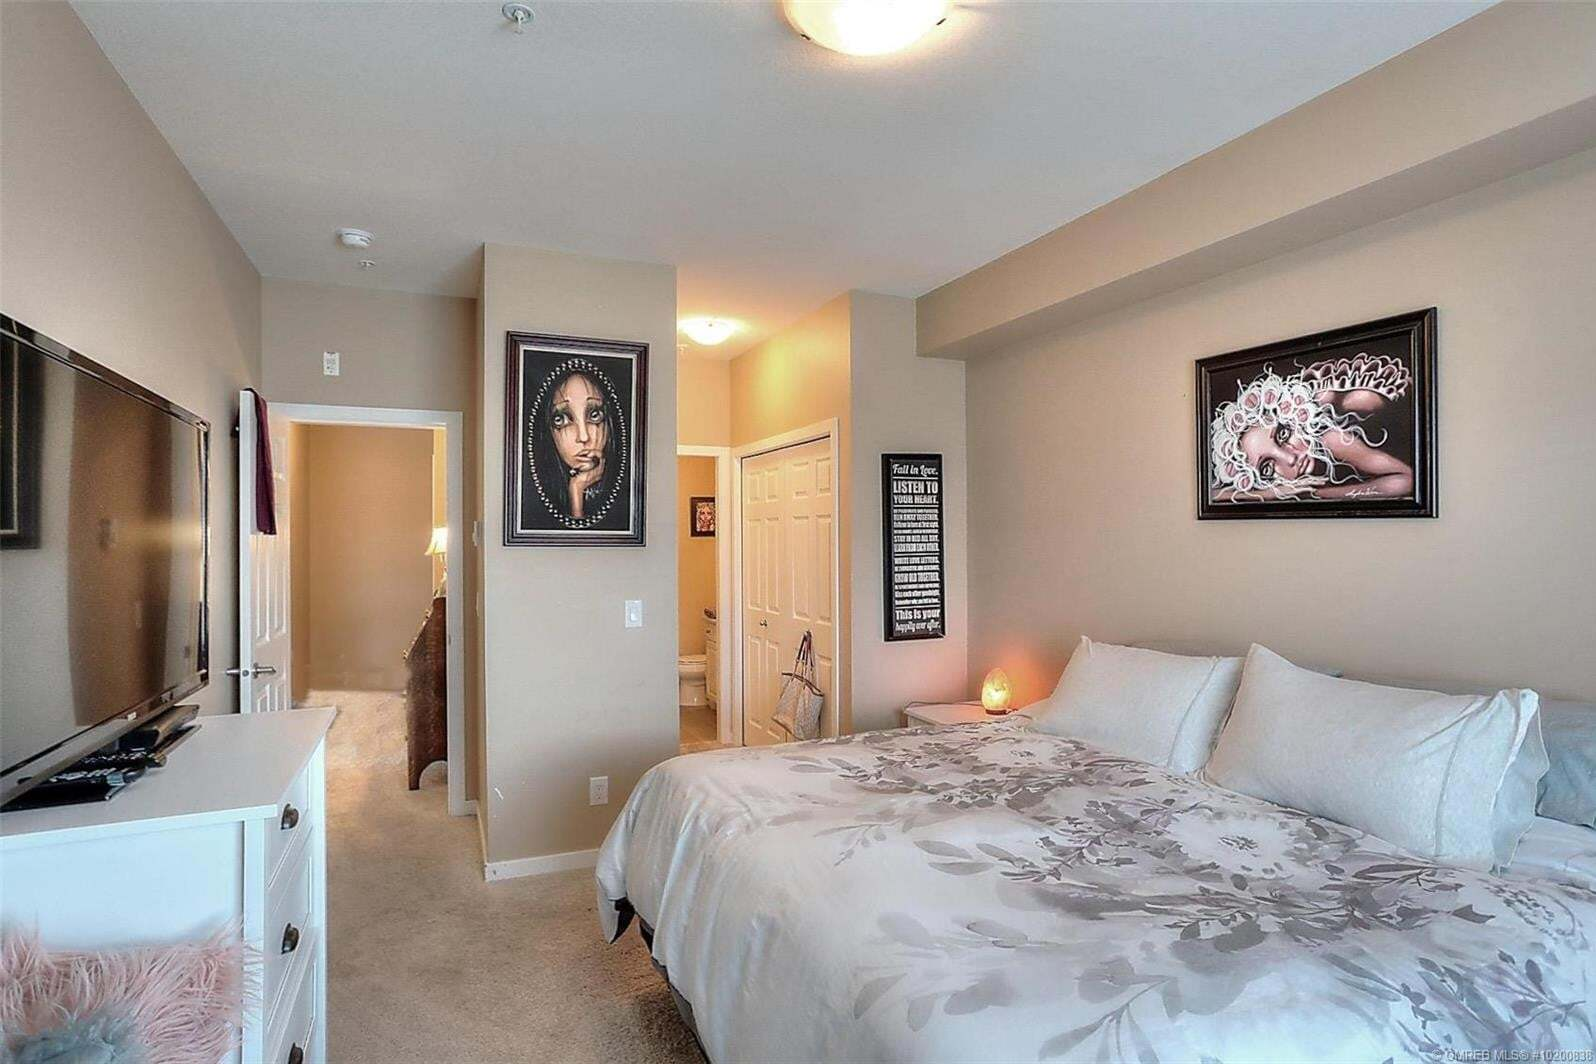 Condo for sale at 770 Rutland Rd North Kelowna British Columbia - MLS: 10200838